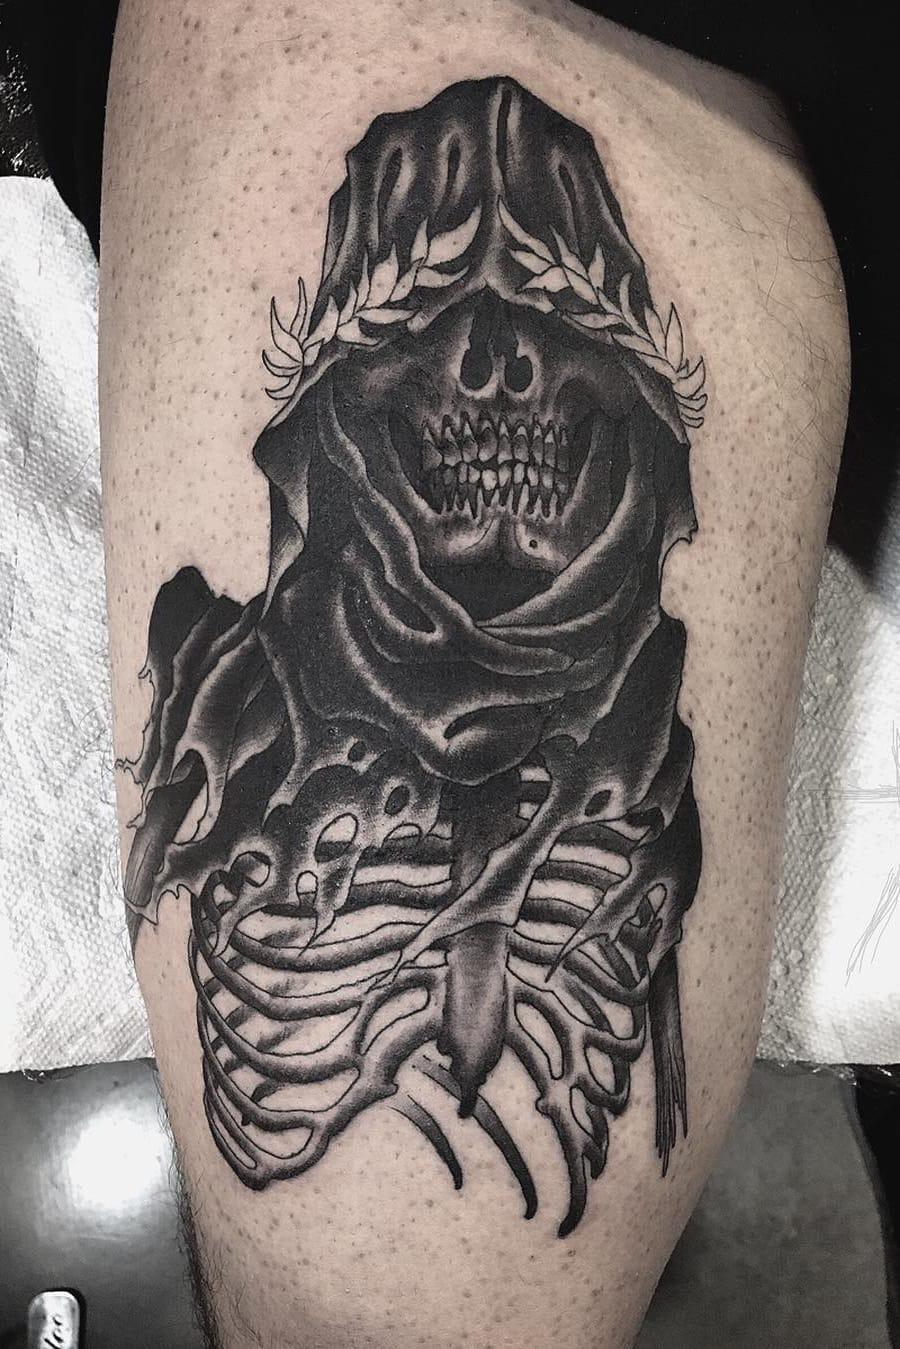 Caveirinha #ChristopherJadeCuevas #CJTattooer #gringo #blackwork #fromhell #dark #skull #caveira #folha #leaf #bones #ossos #morte #death